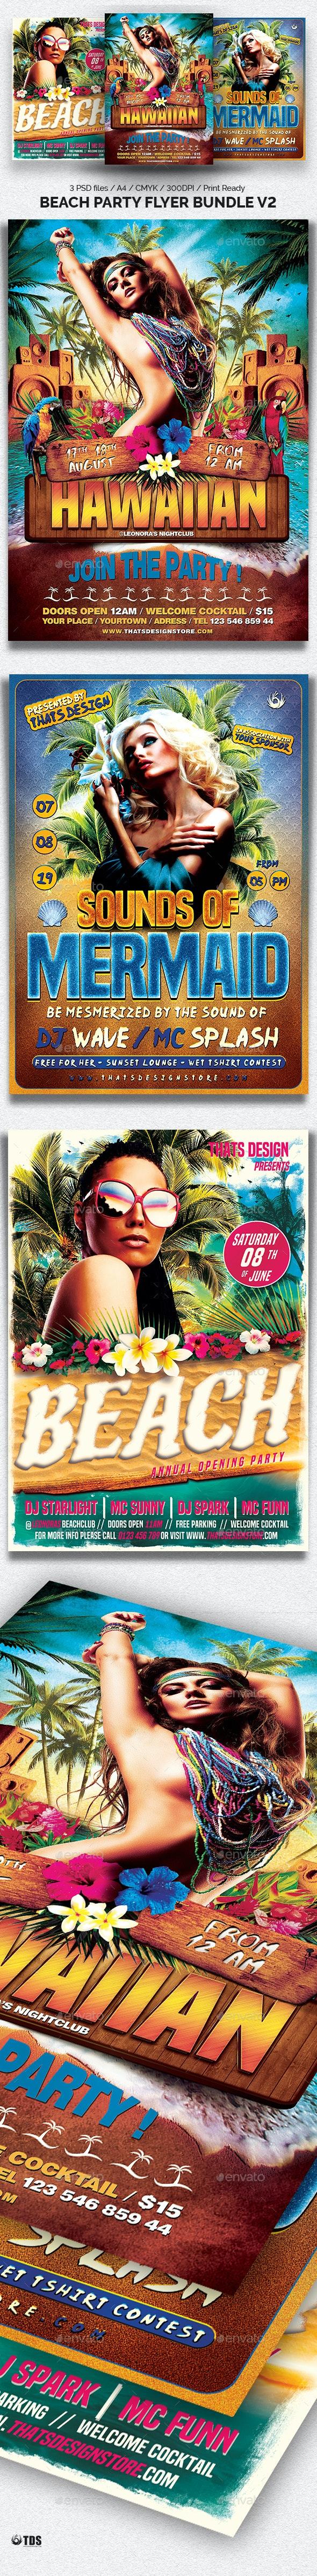 Beach Party Flyer Bundle V2 - Clubs & Parties Events